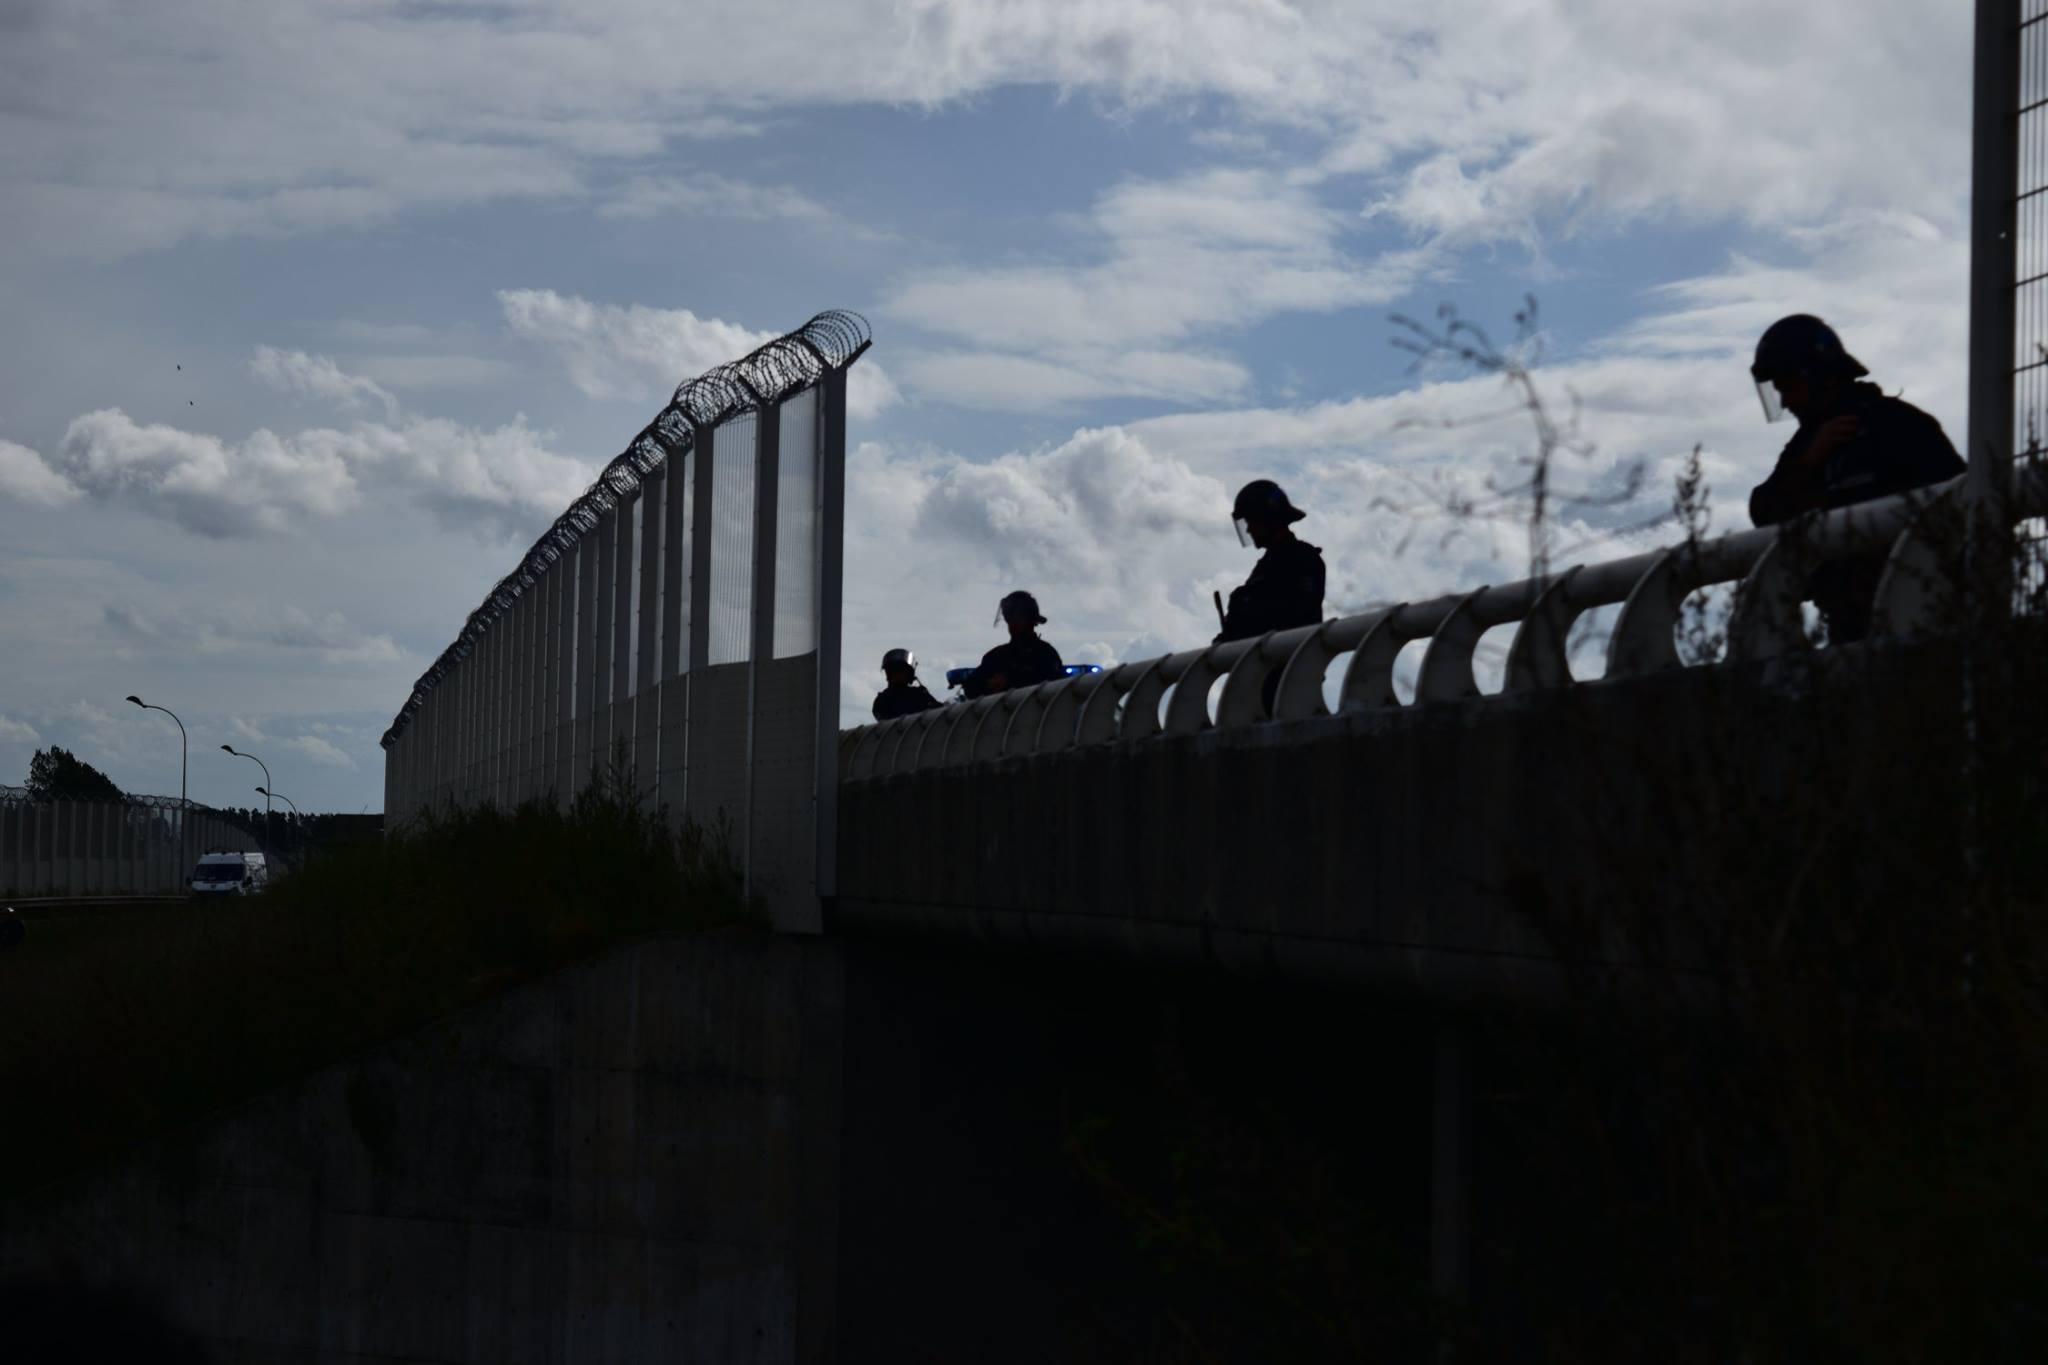 Callais, France refugee protest